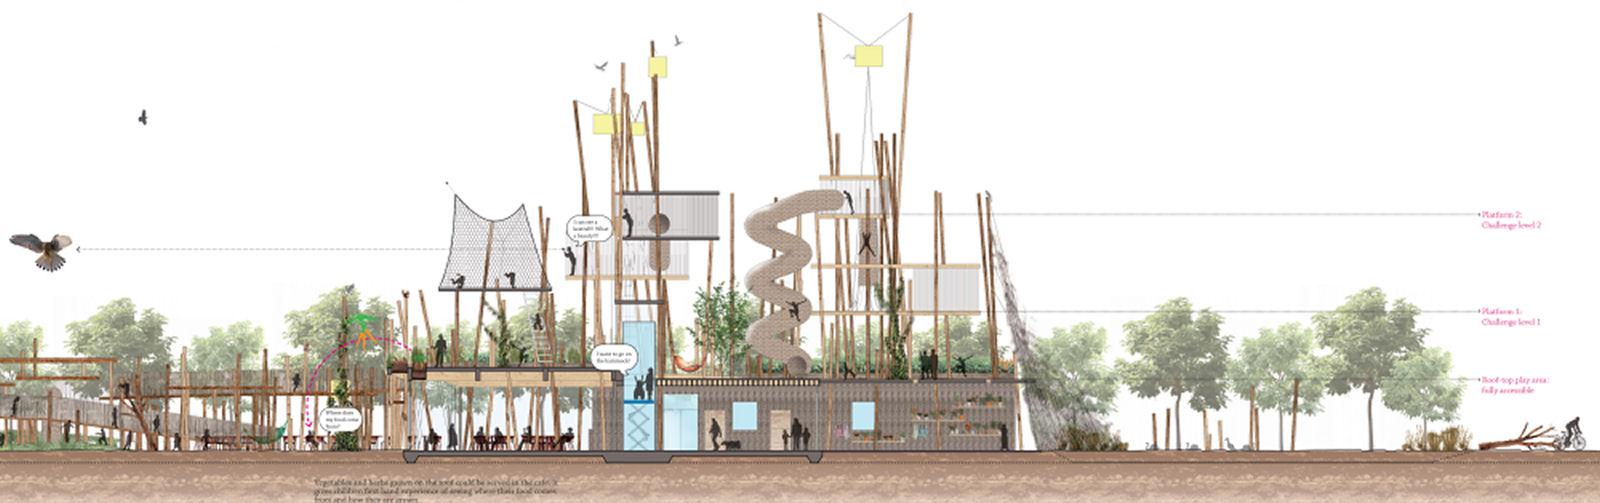 Design by Erect Architecture